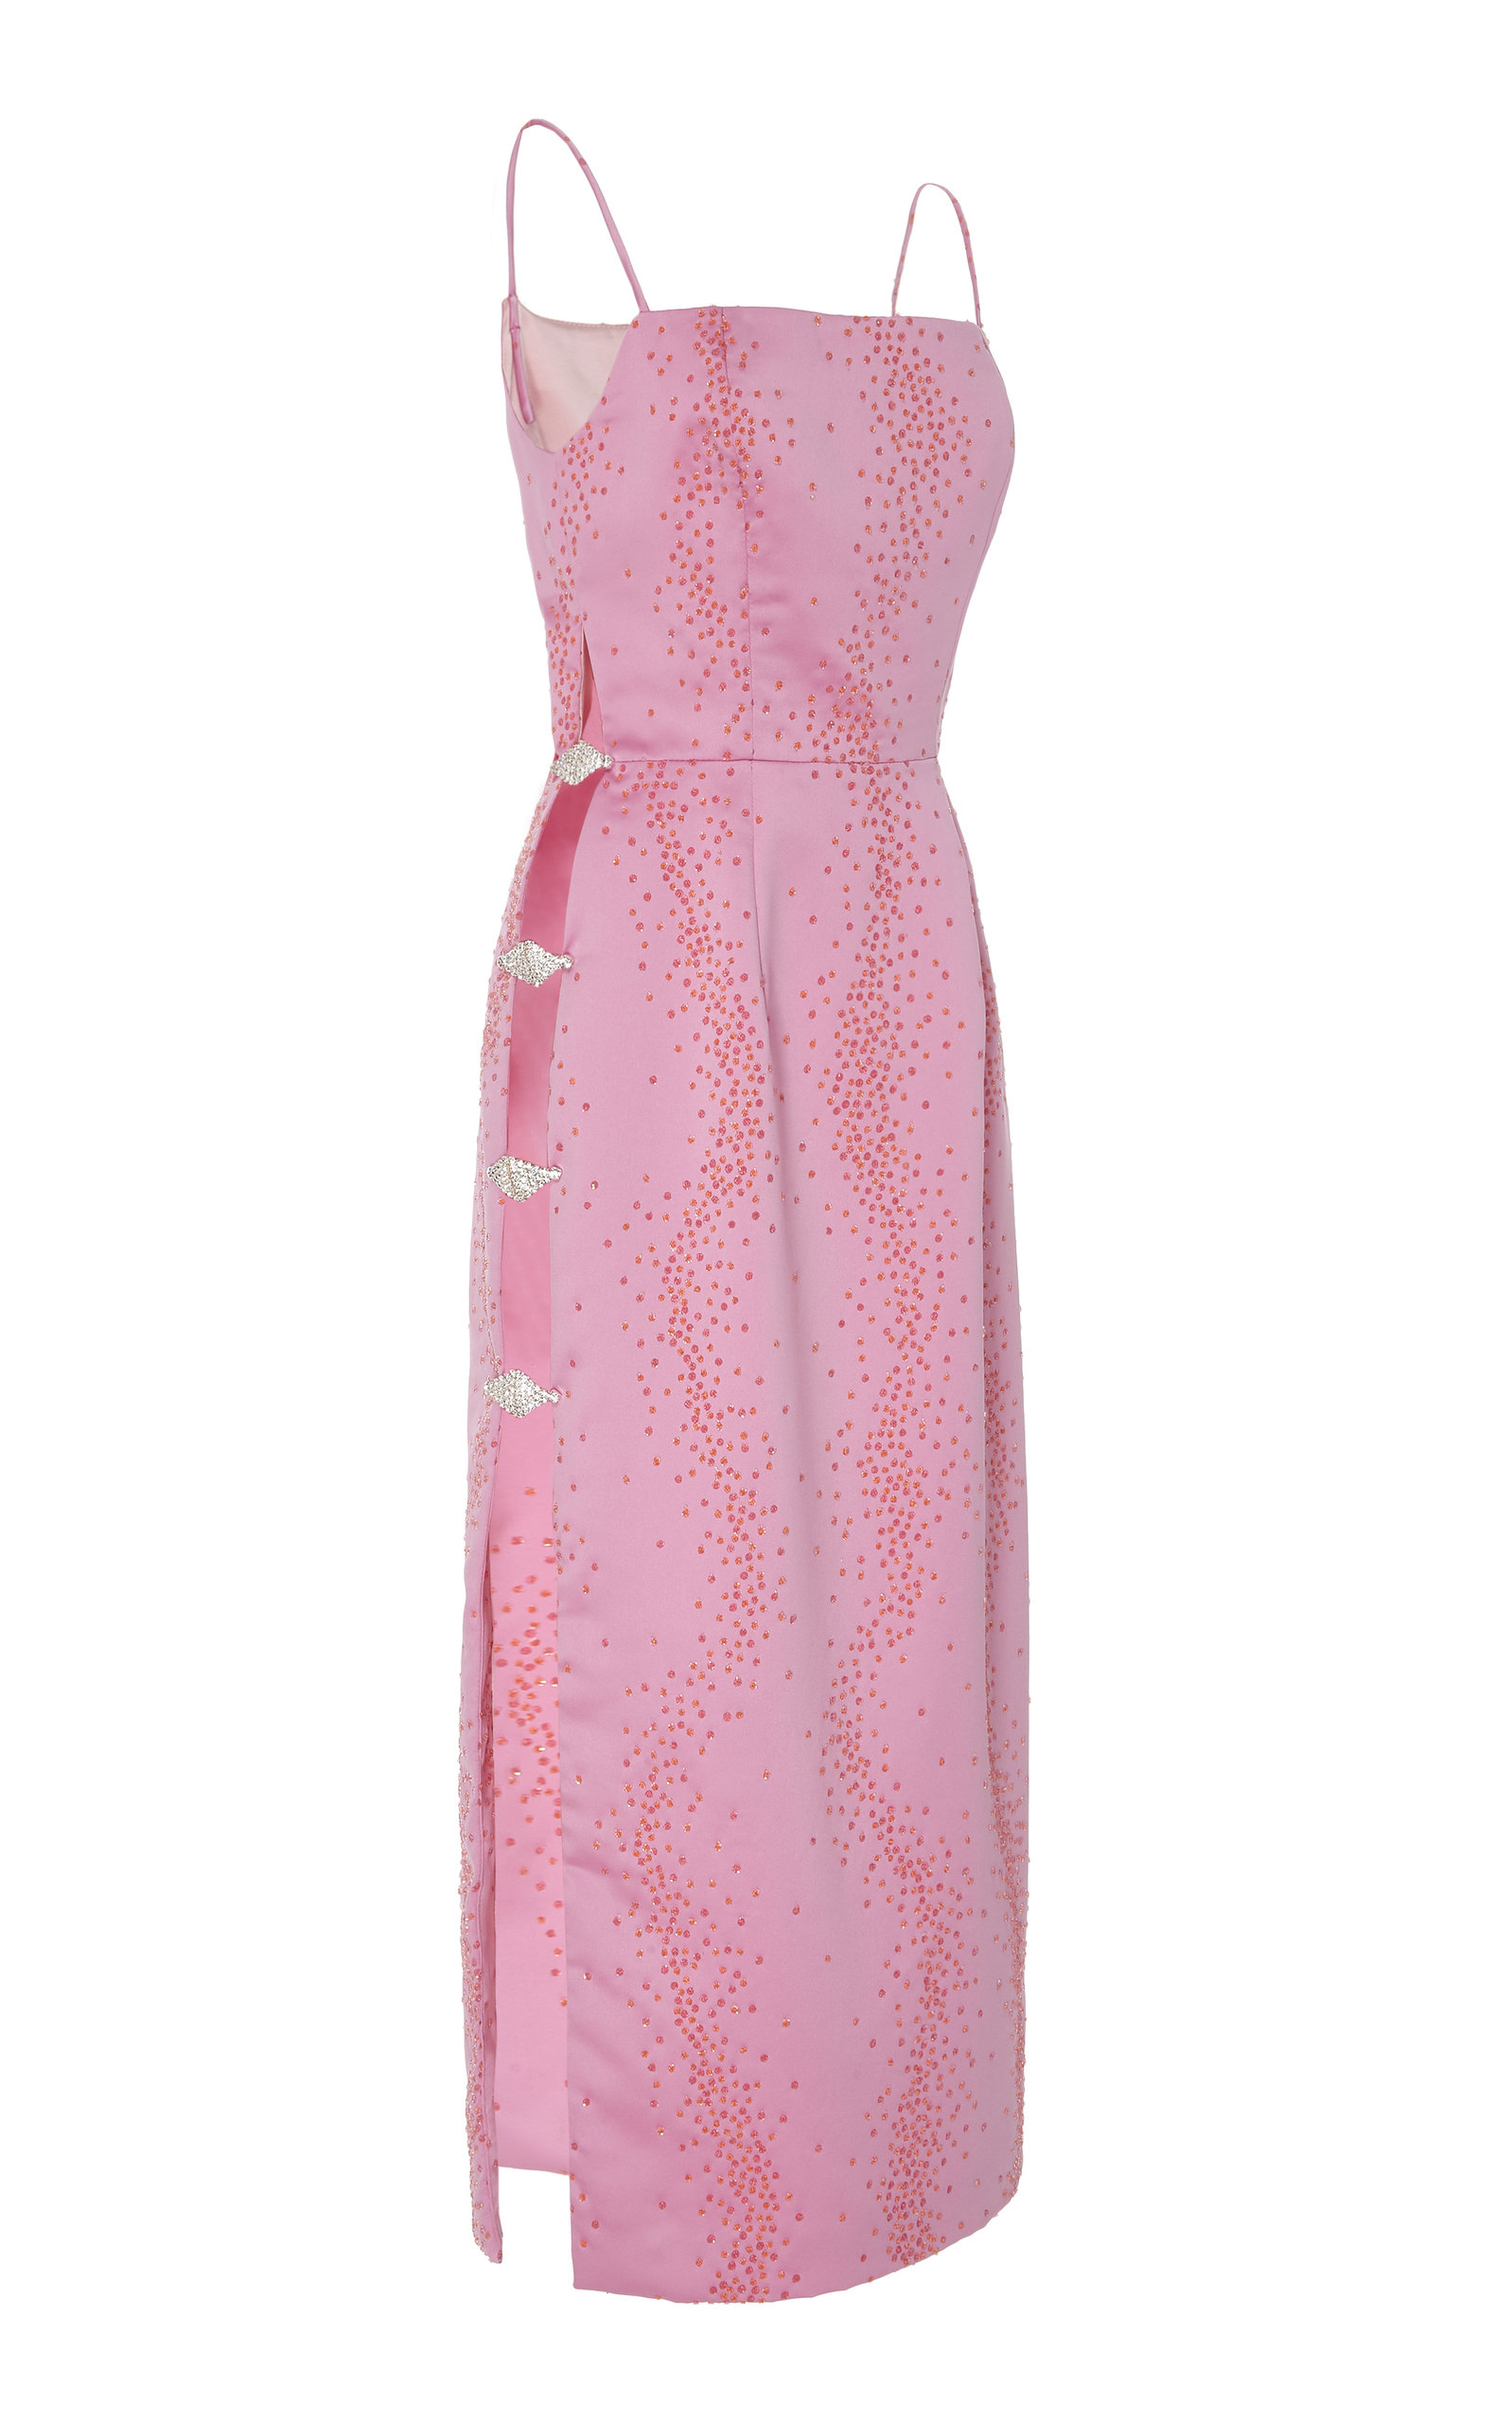 ed5296cdb3b1 MarkarianExclusive Ruhi Embellished Silk Midi Dress. CLOSE. Loading. Loading